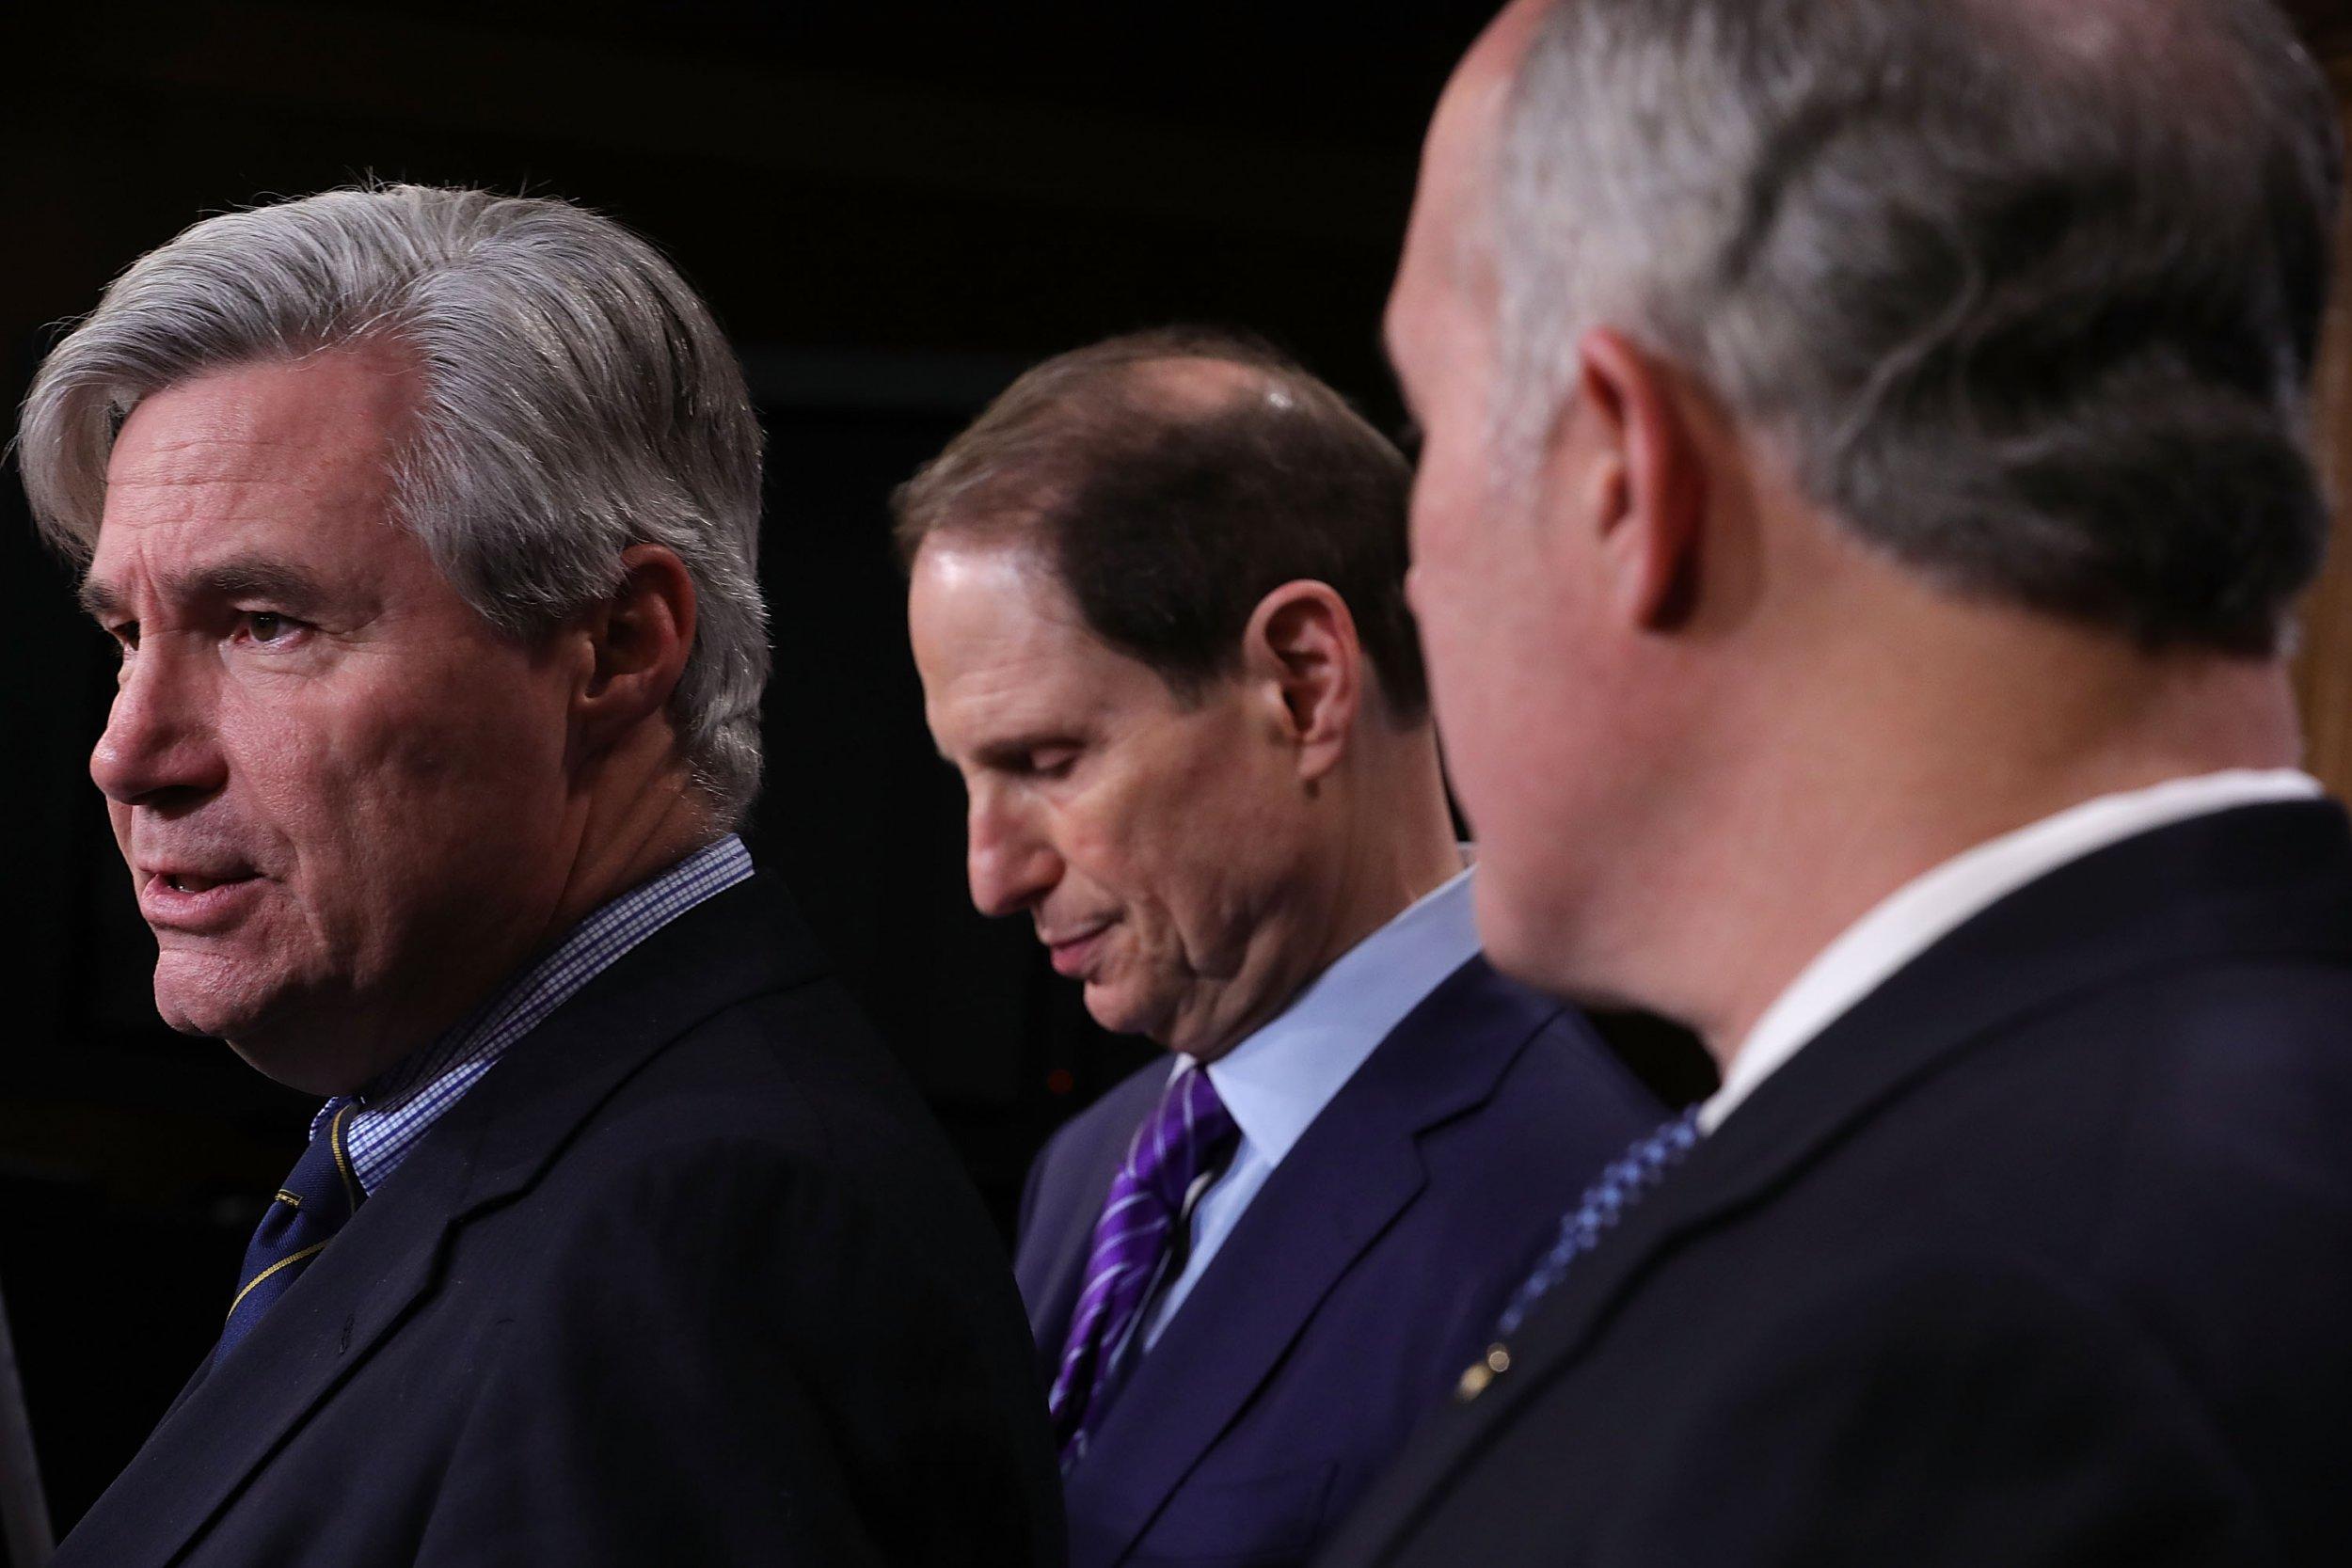 Senate Democrats probe NRA, alleged financial wrongdoing